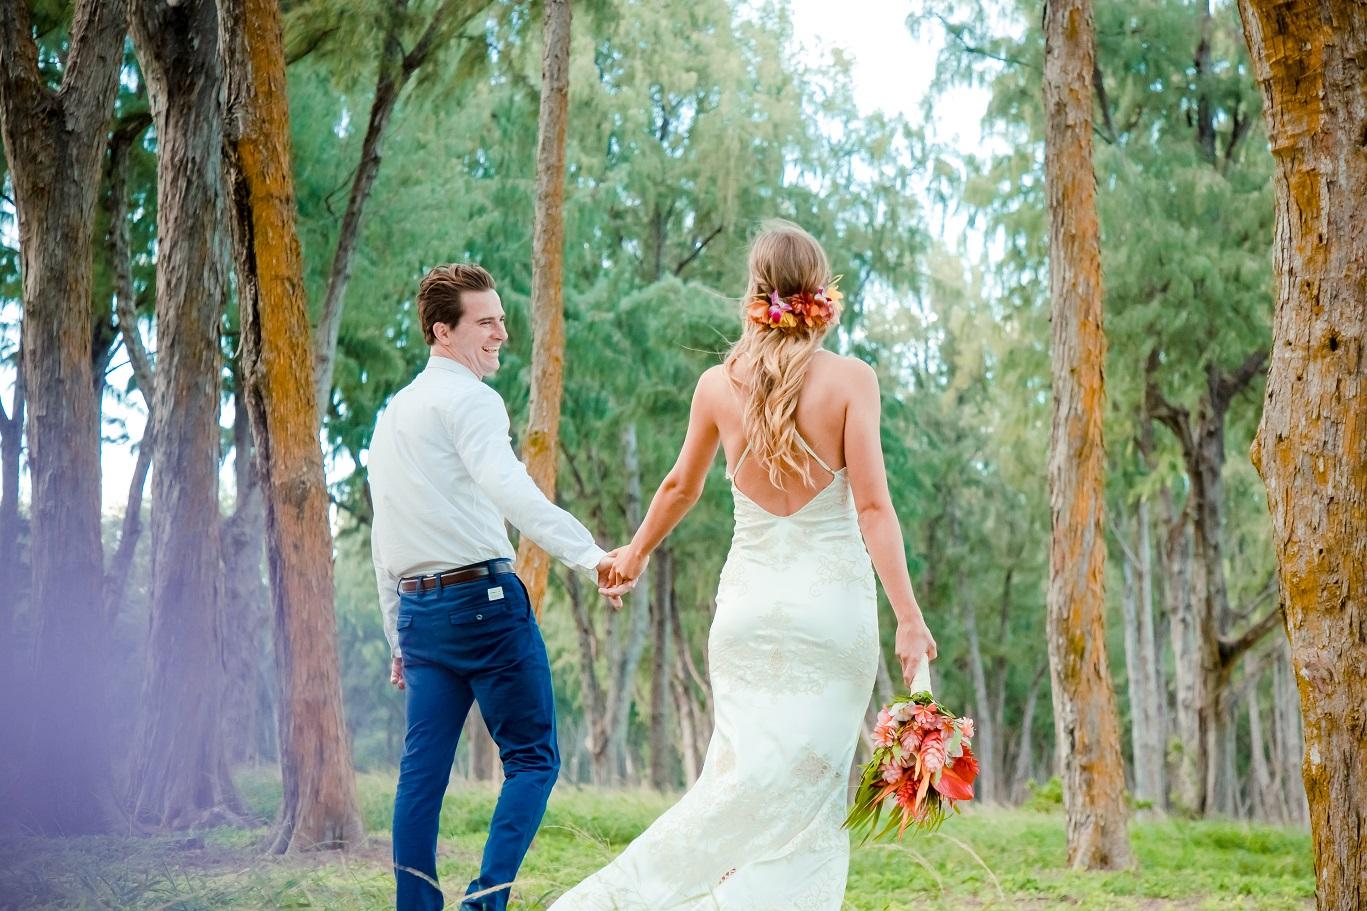 bride & groom wedding day portrait